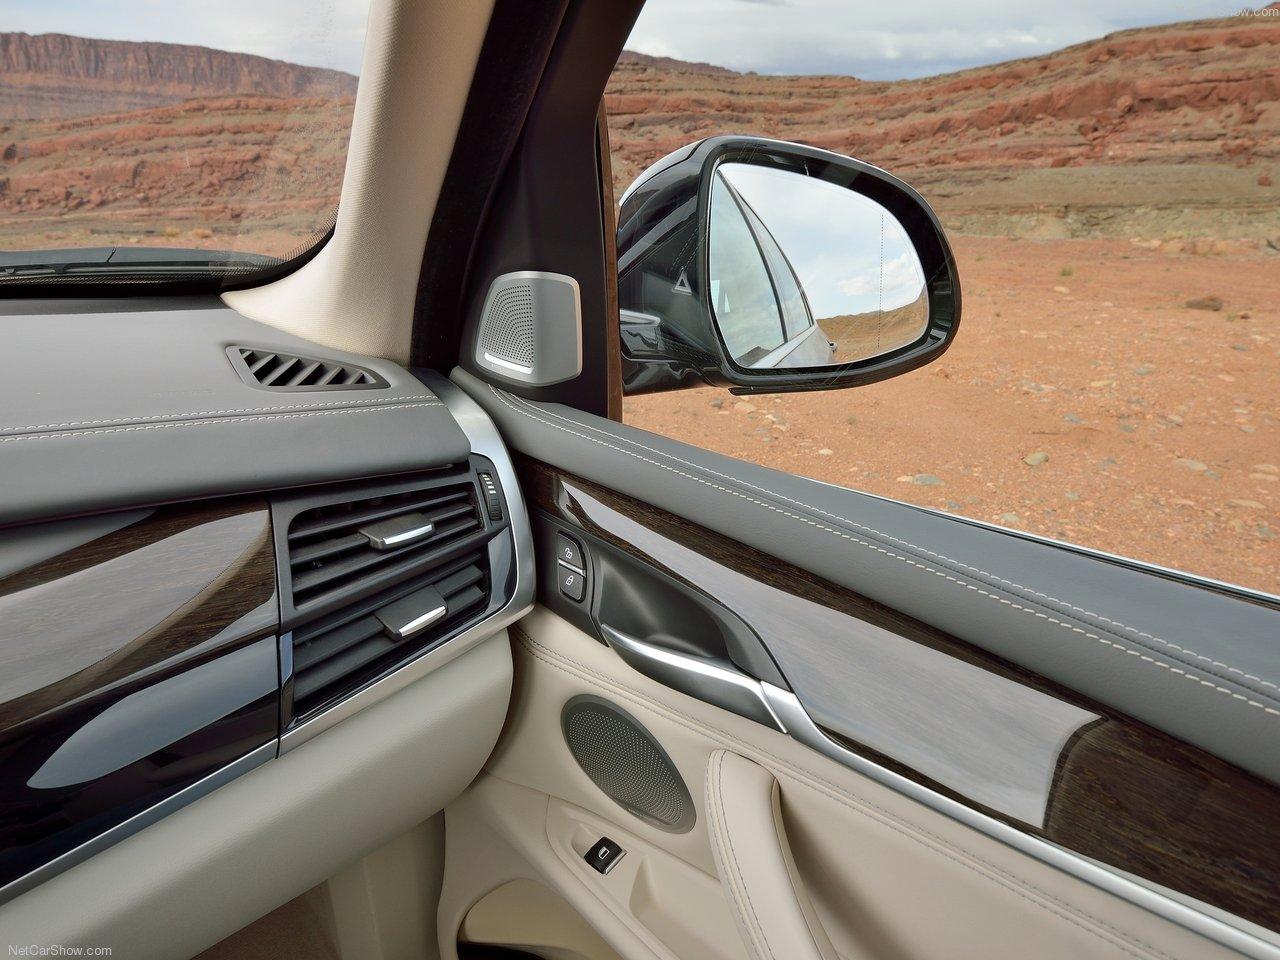 БМВ Х5 2018 — комплектации, цены, фото и характеристики